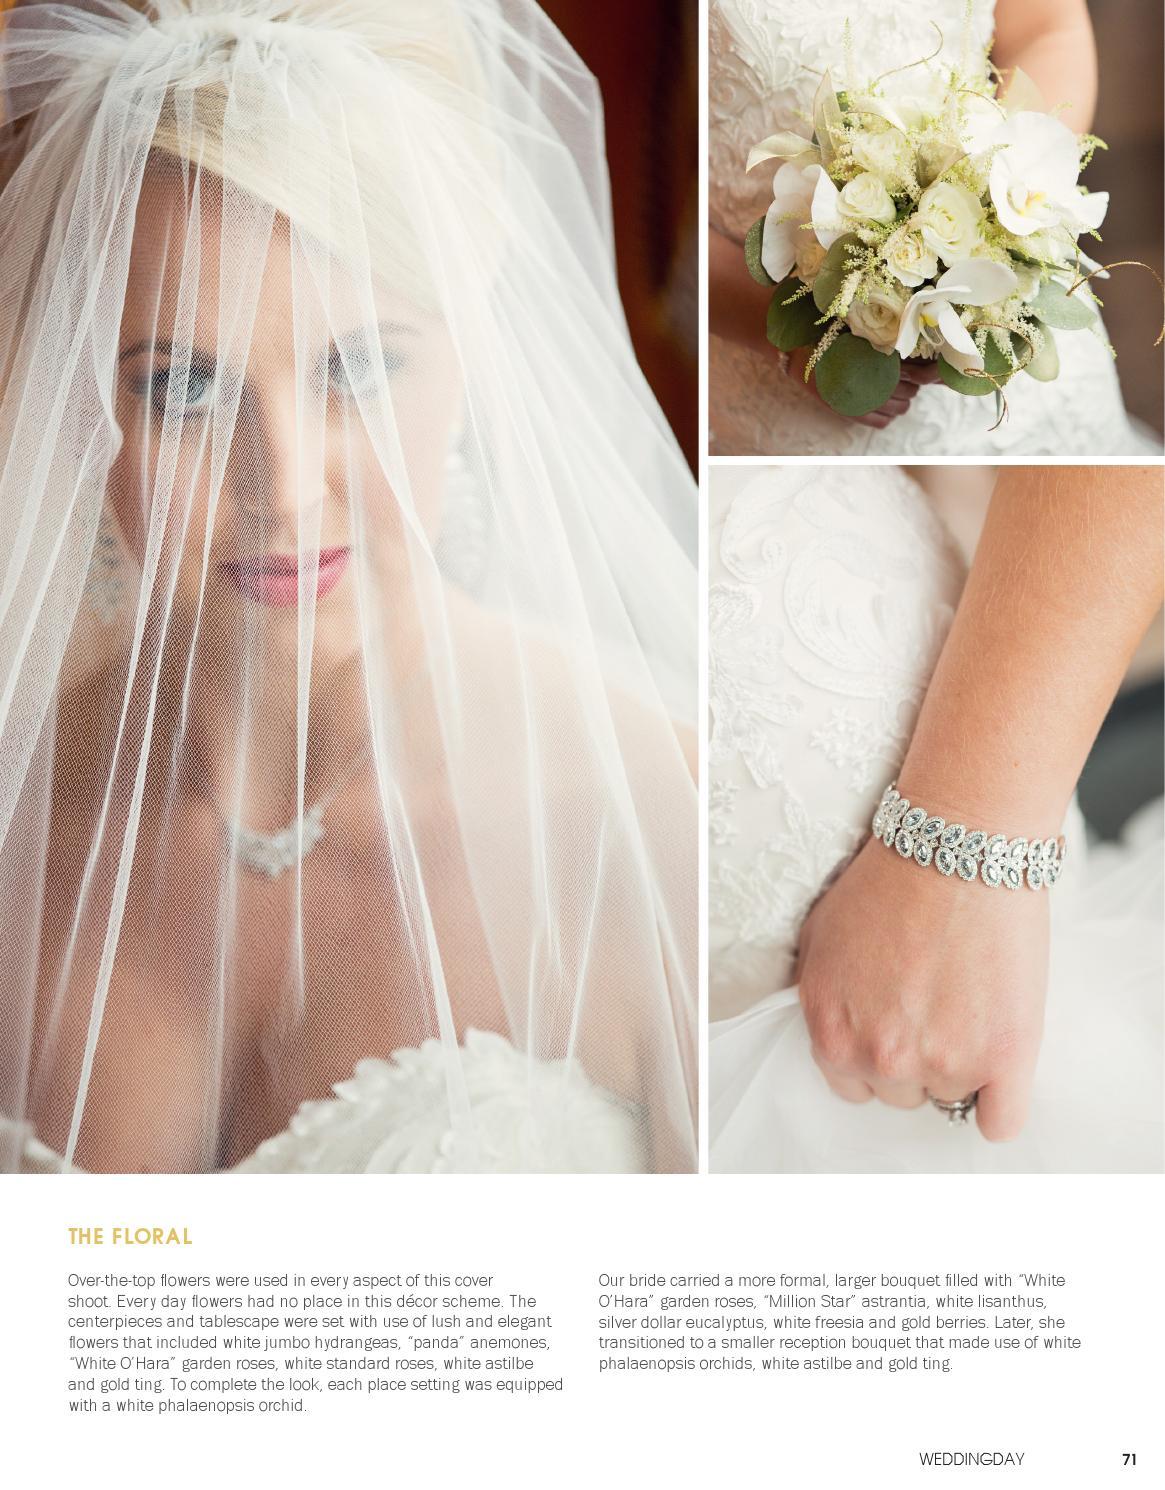 WeddingDay Magazine - Northern Indiana Issue 1 2016 by Life